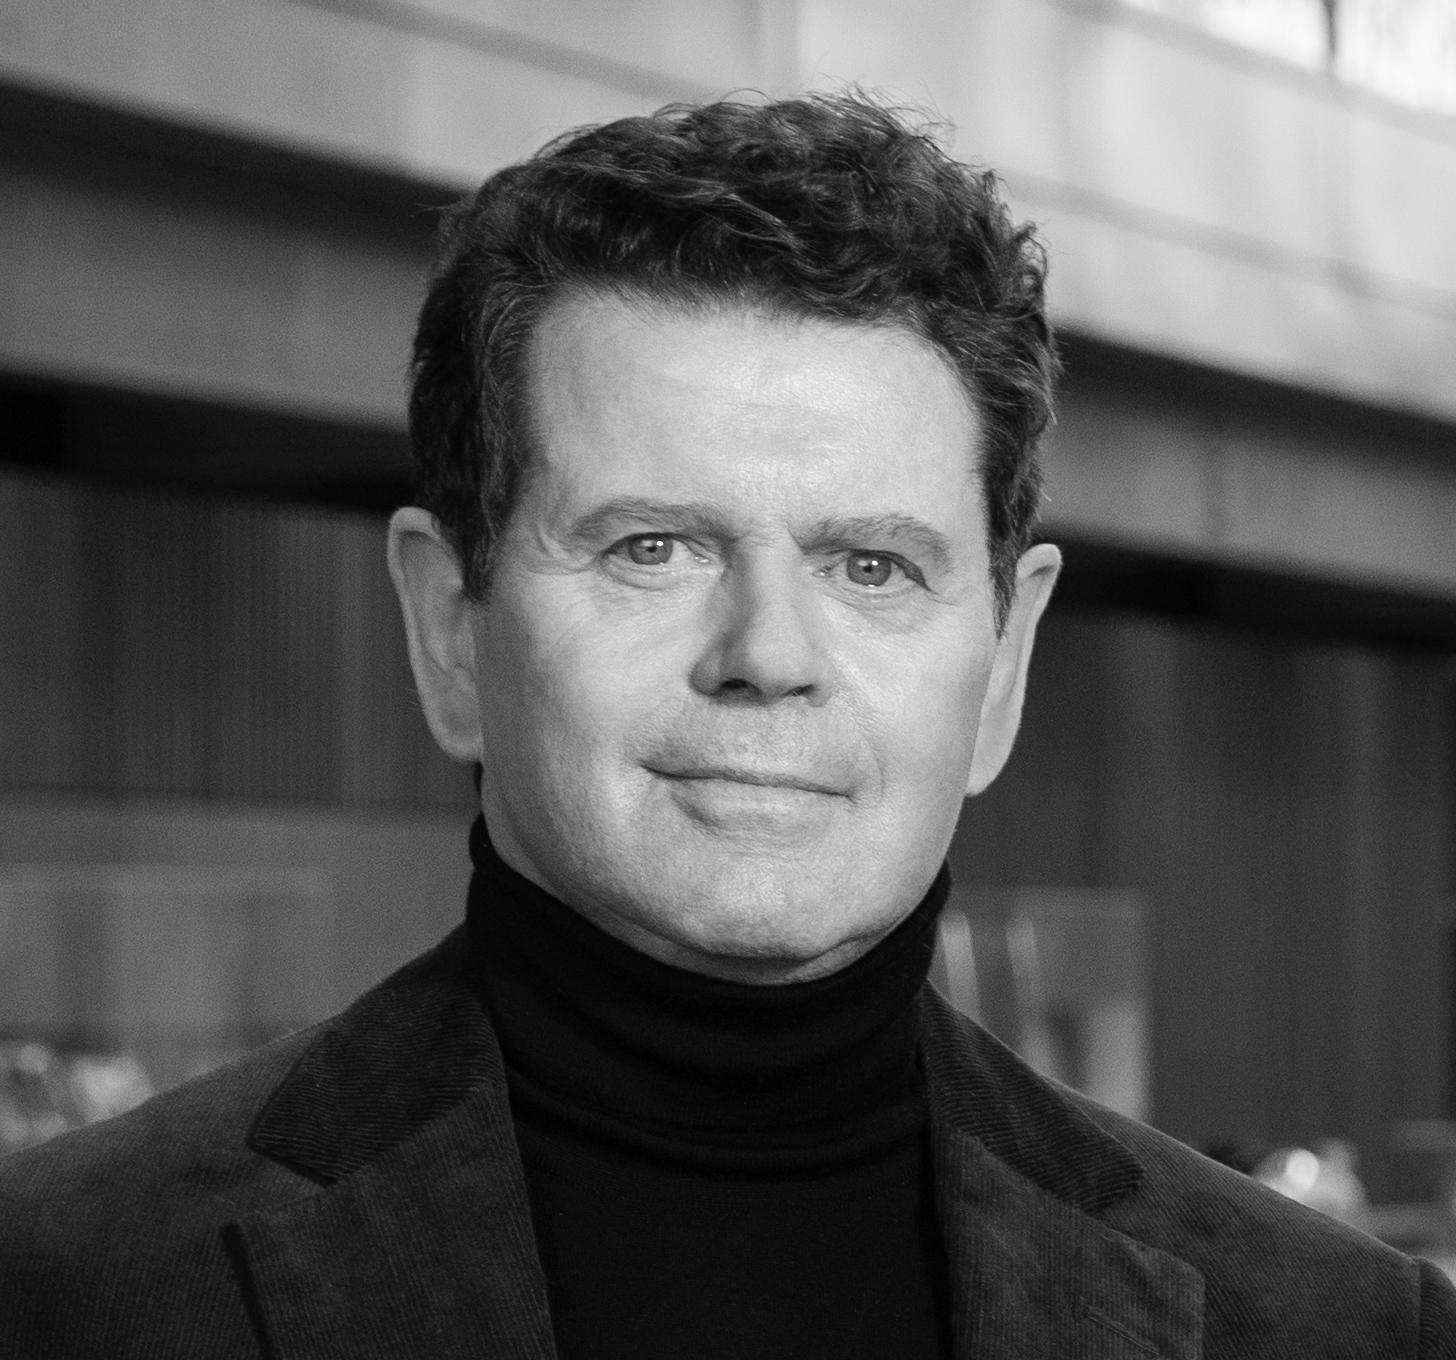 PROFESSOR GERRY McGOVERN OBE